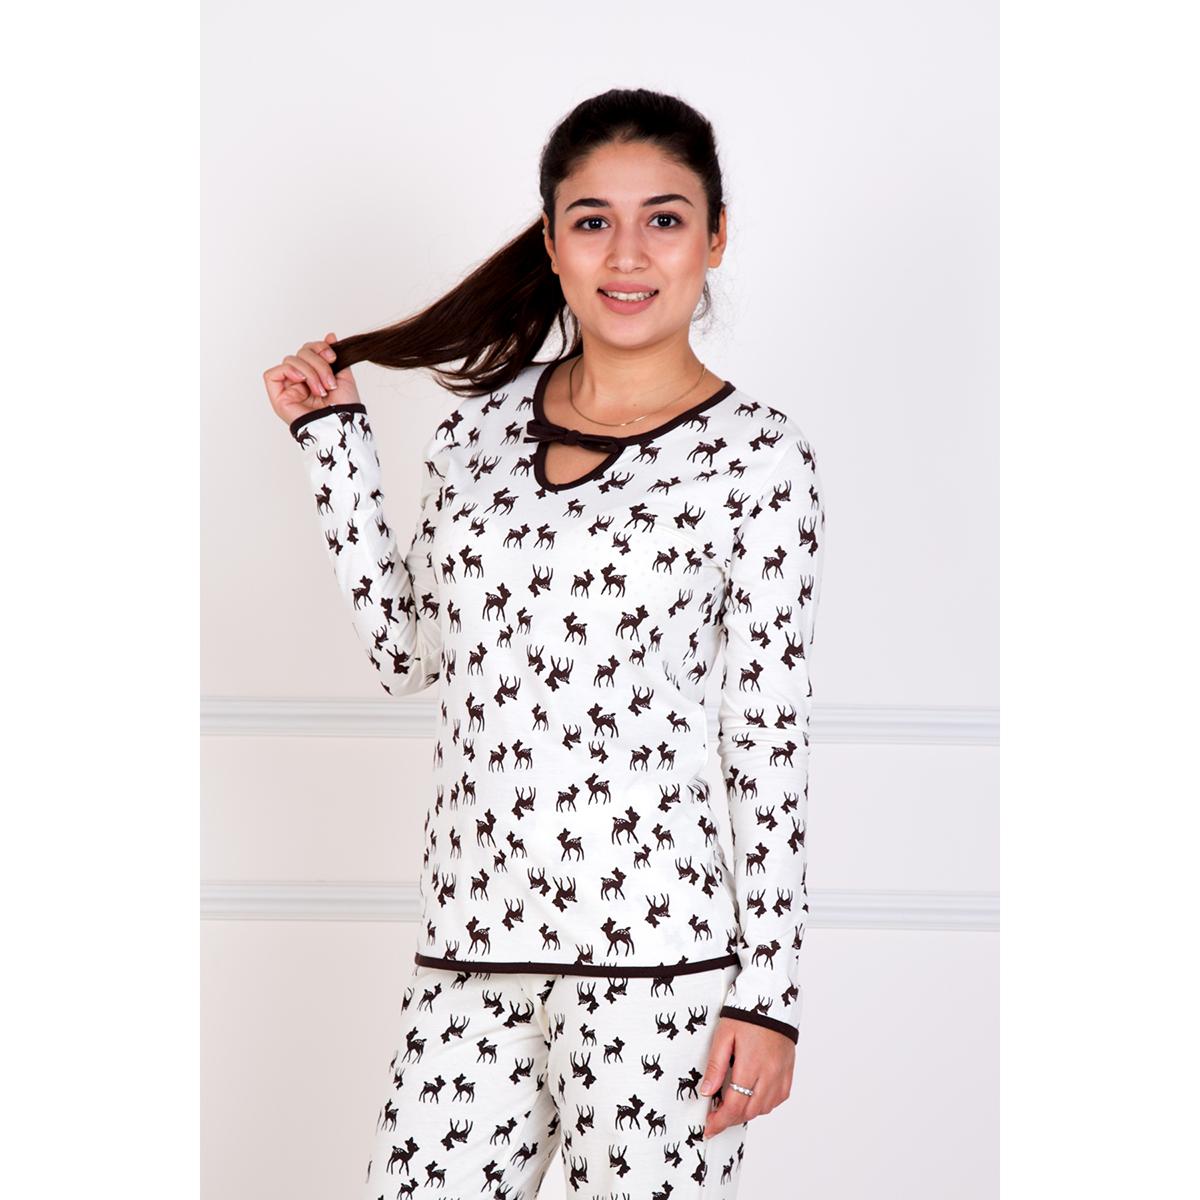 Женская пижама Олененок, размер 50Пижамы<br>Обхват груди:100 см<br>Обхват талии:82 см<br>Обхват бедер:108 см<br>Рост:167 см<br><br>Тип: Жен. костюм<br>Размер: 50<br>Материал: Кулирка